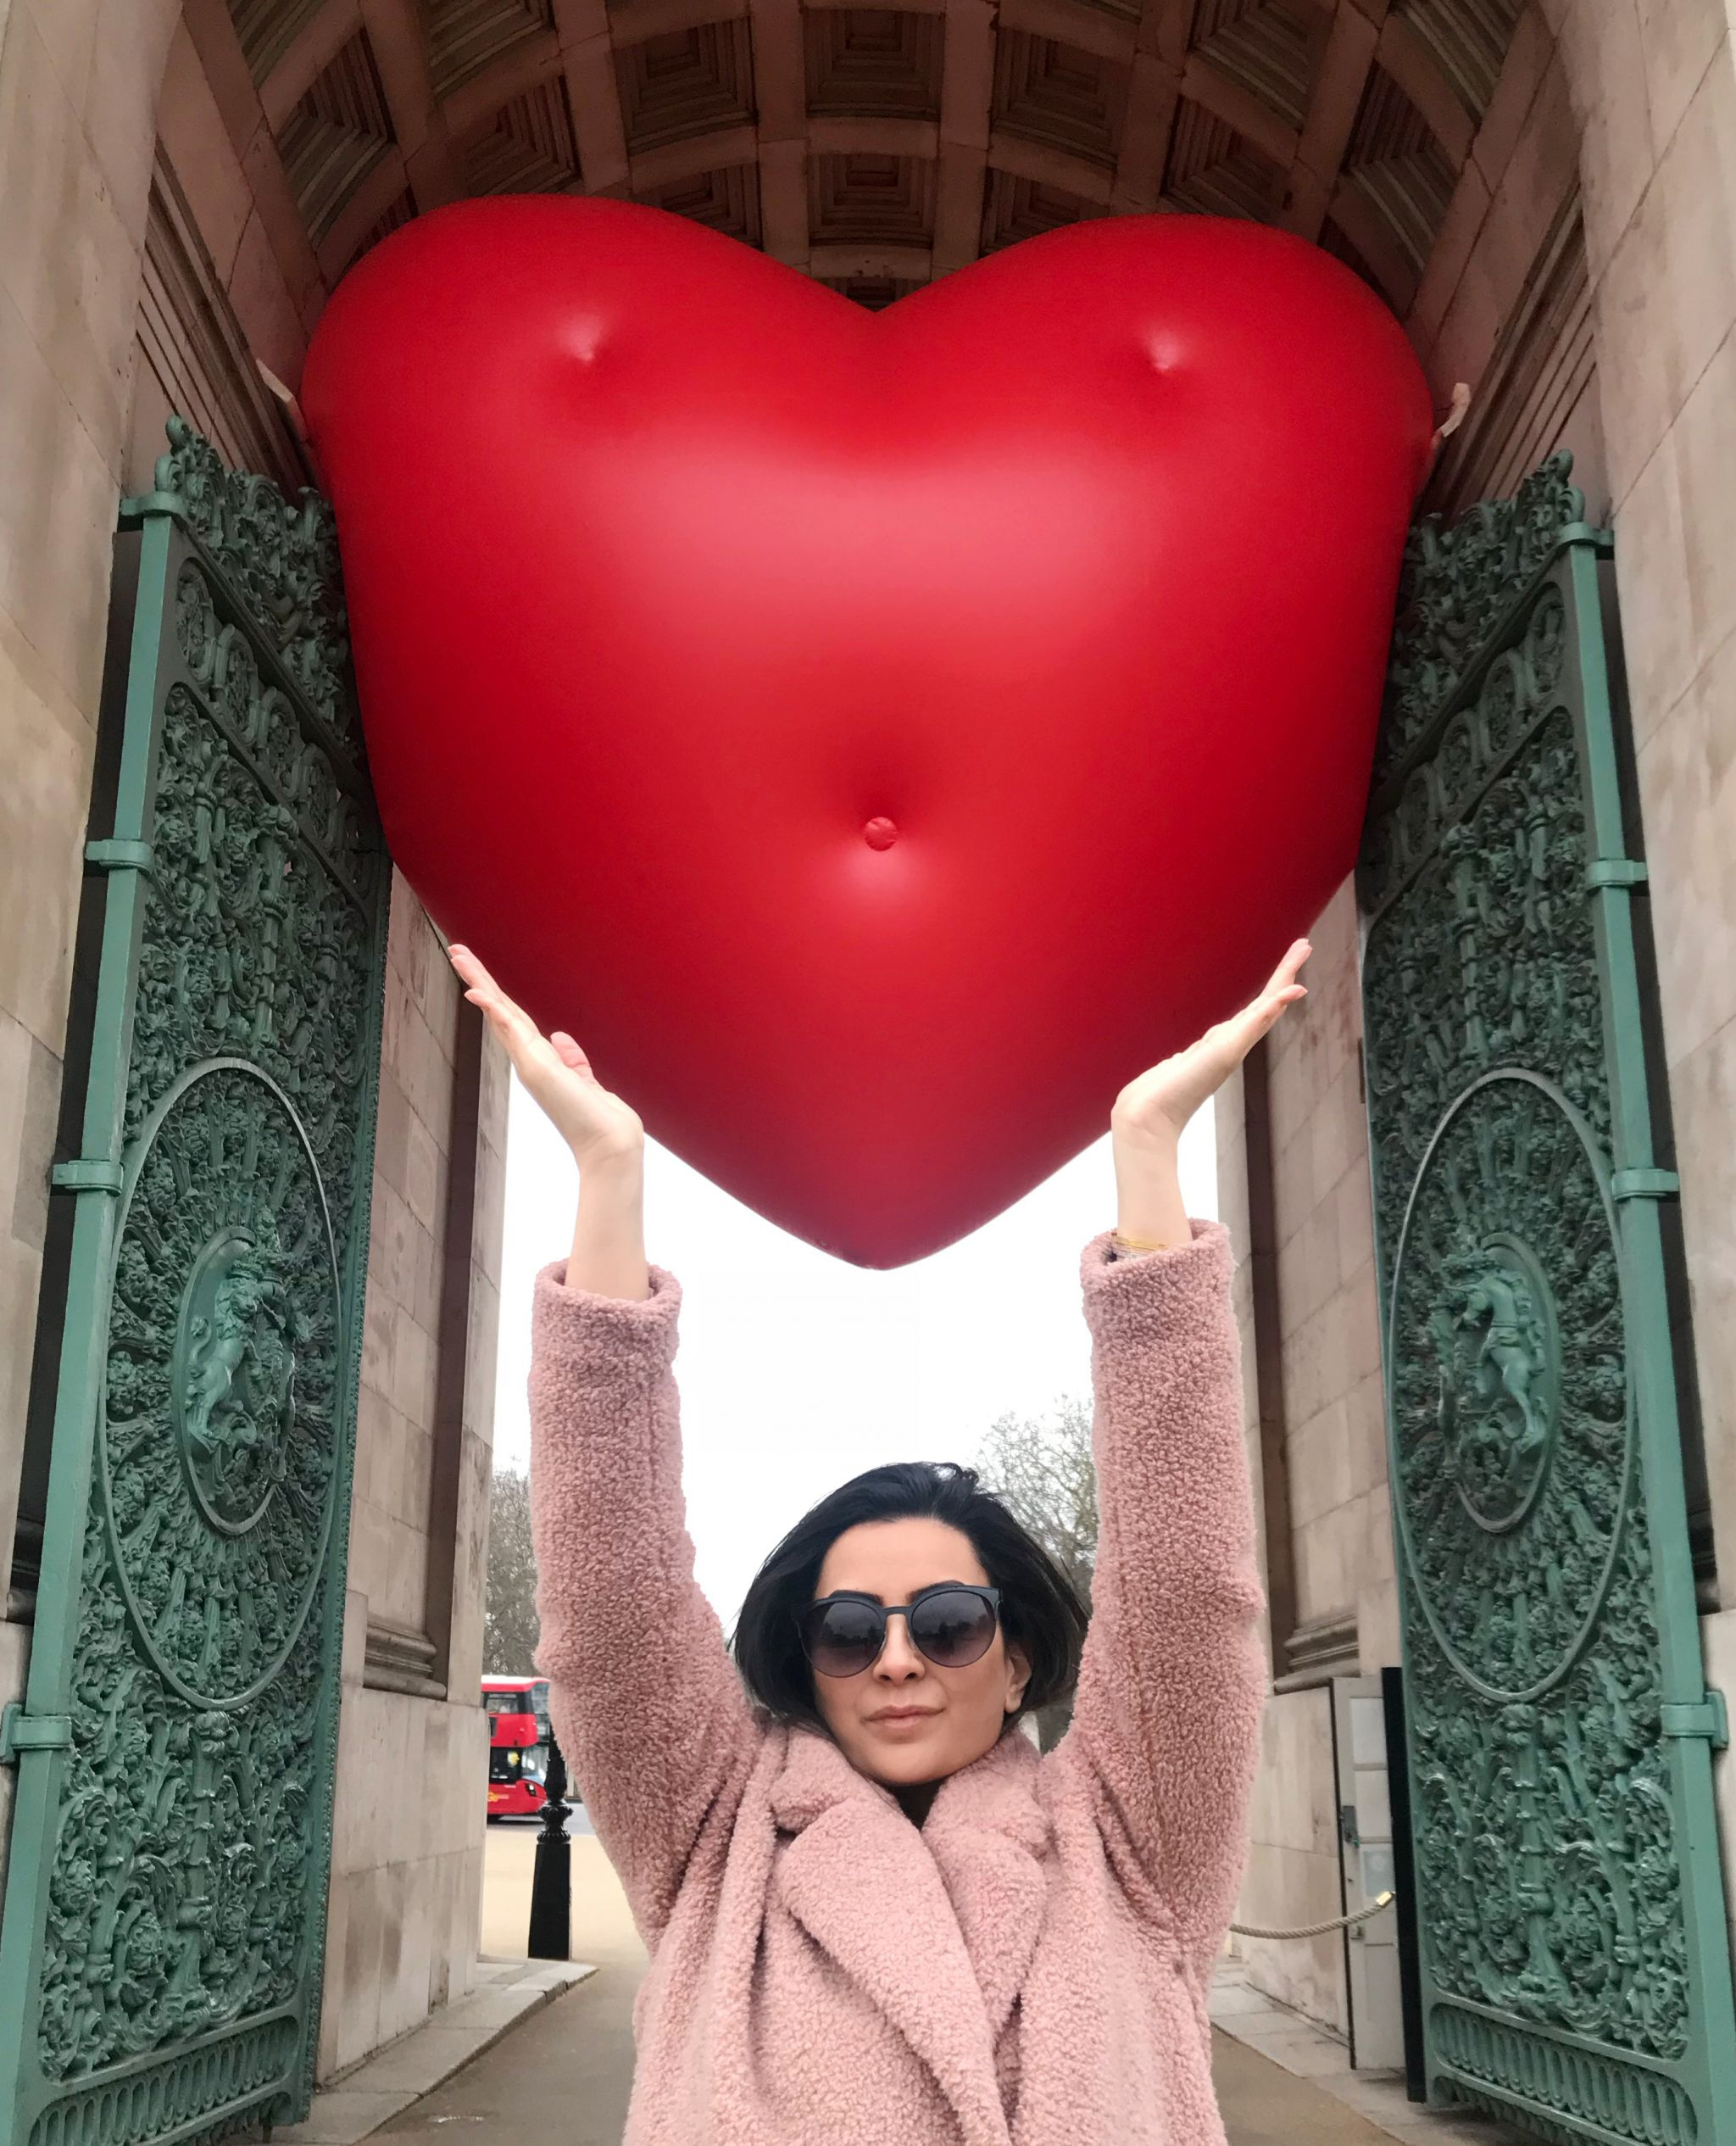 chubby hearts anya hindmarch